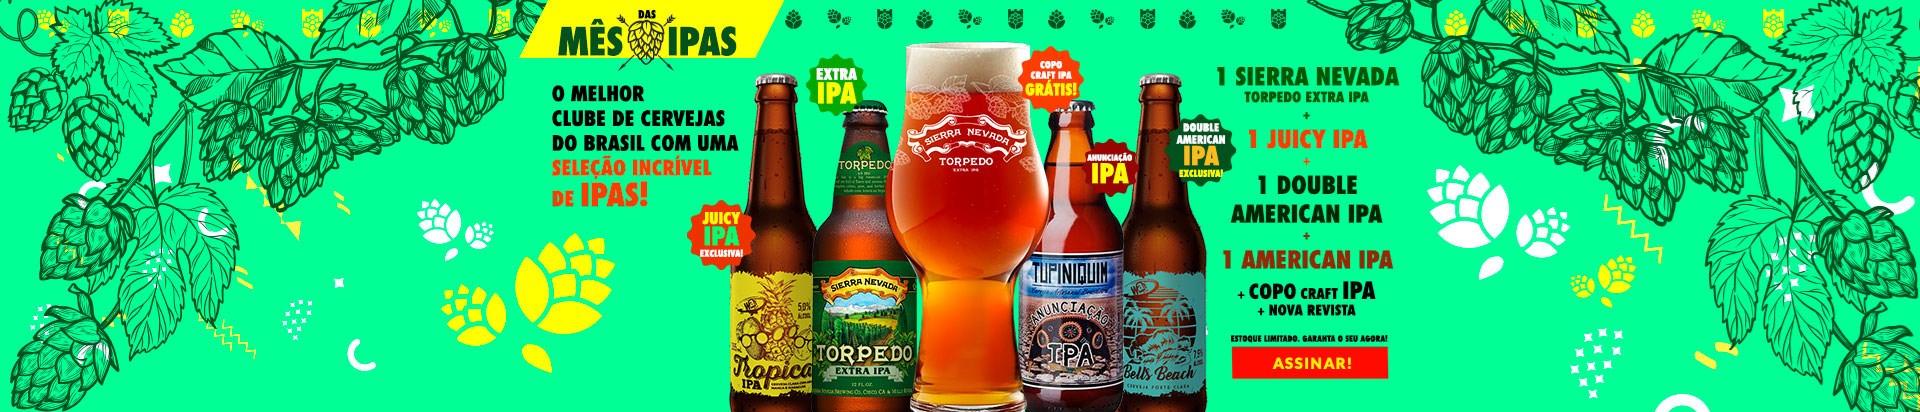 beer pack clube de assinatura de cervejas